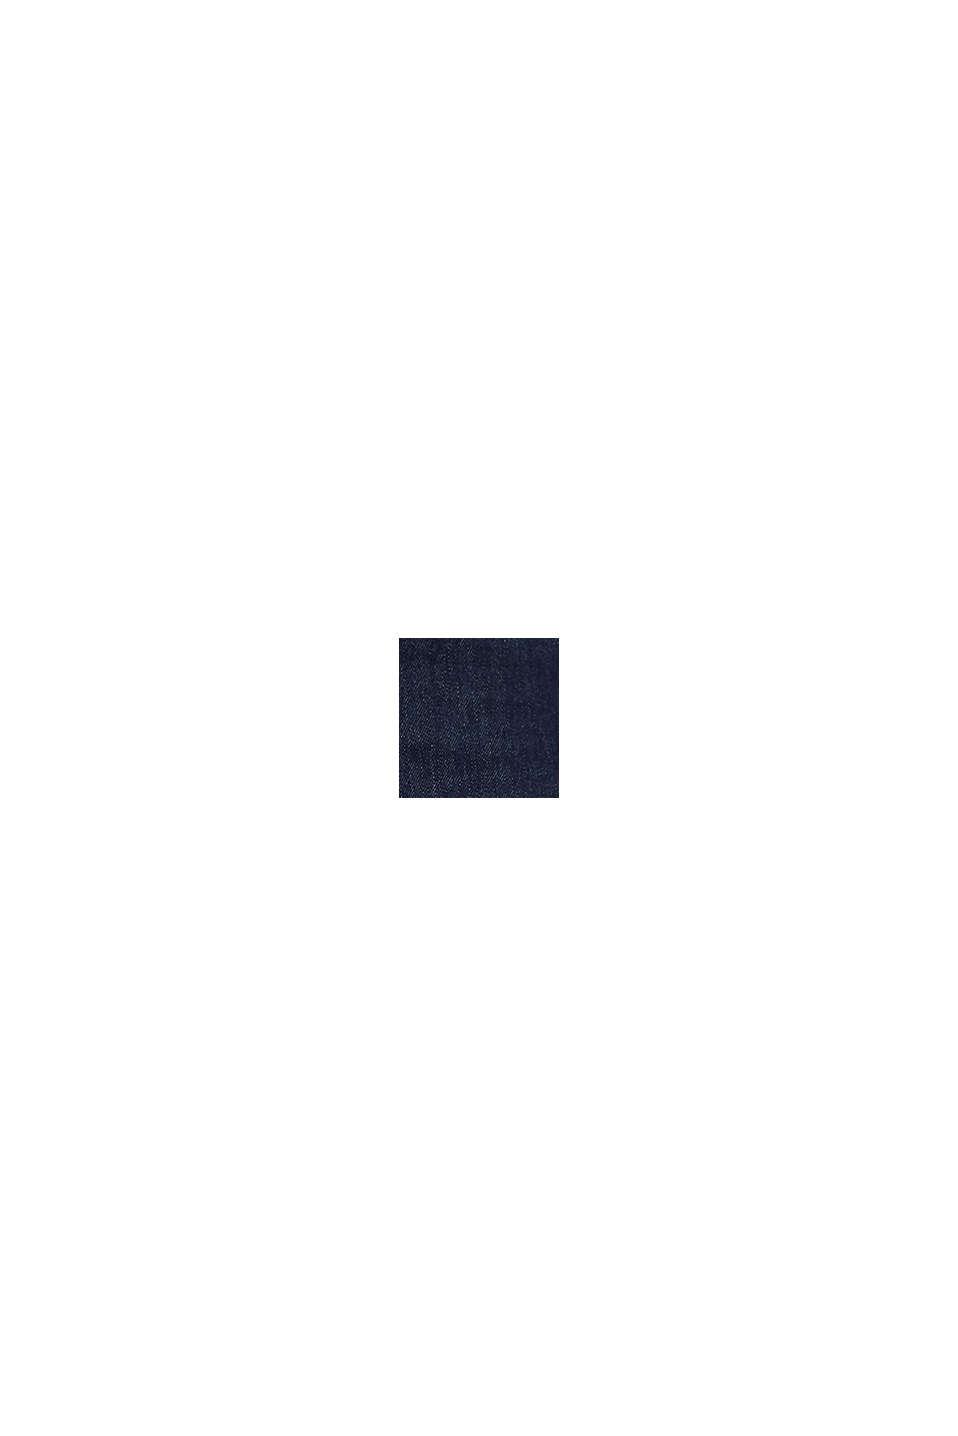 Stretchjeans med sliten tvätt, BLUE RINSE, swatch